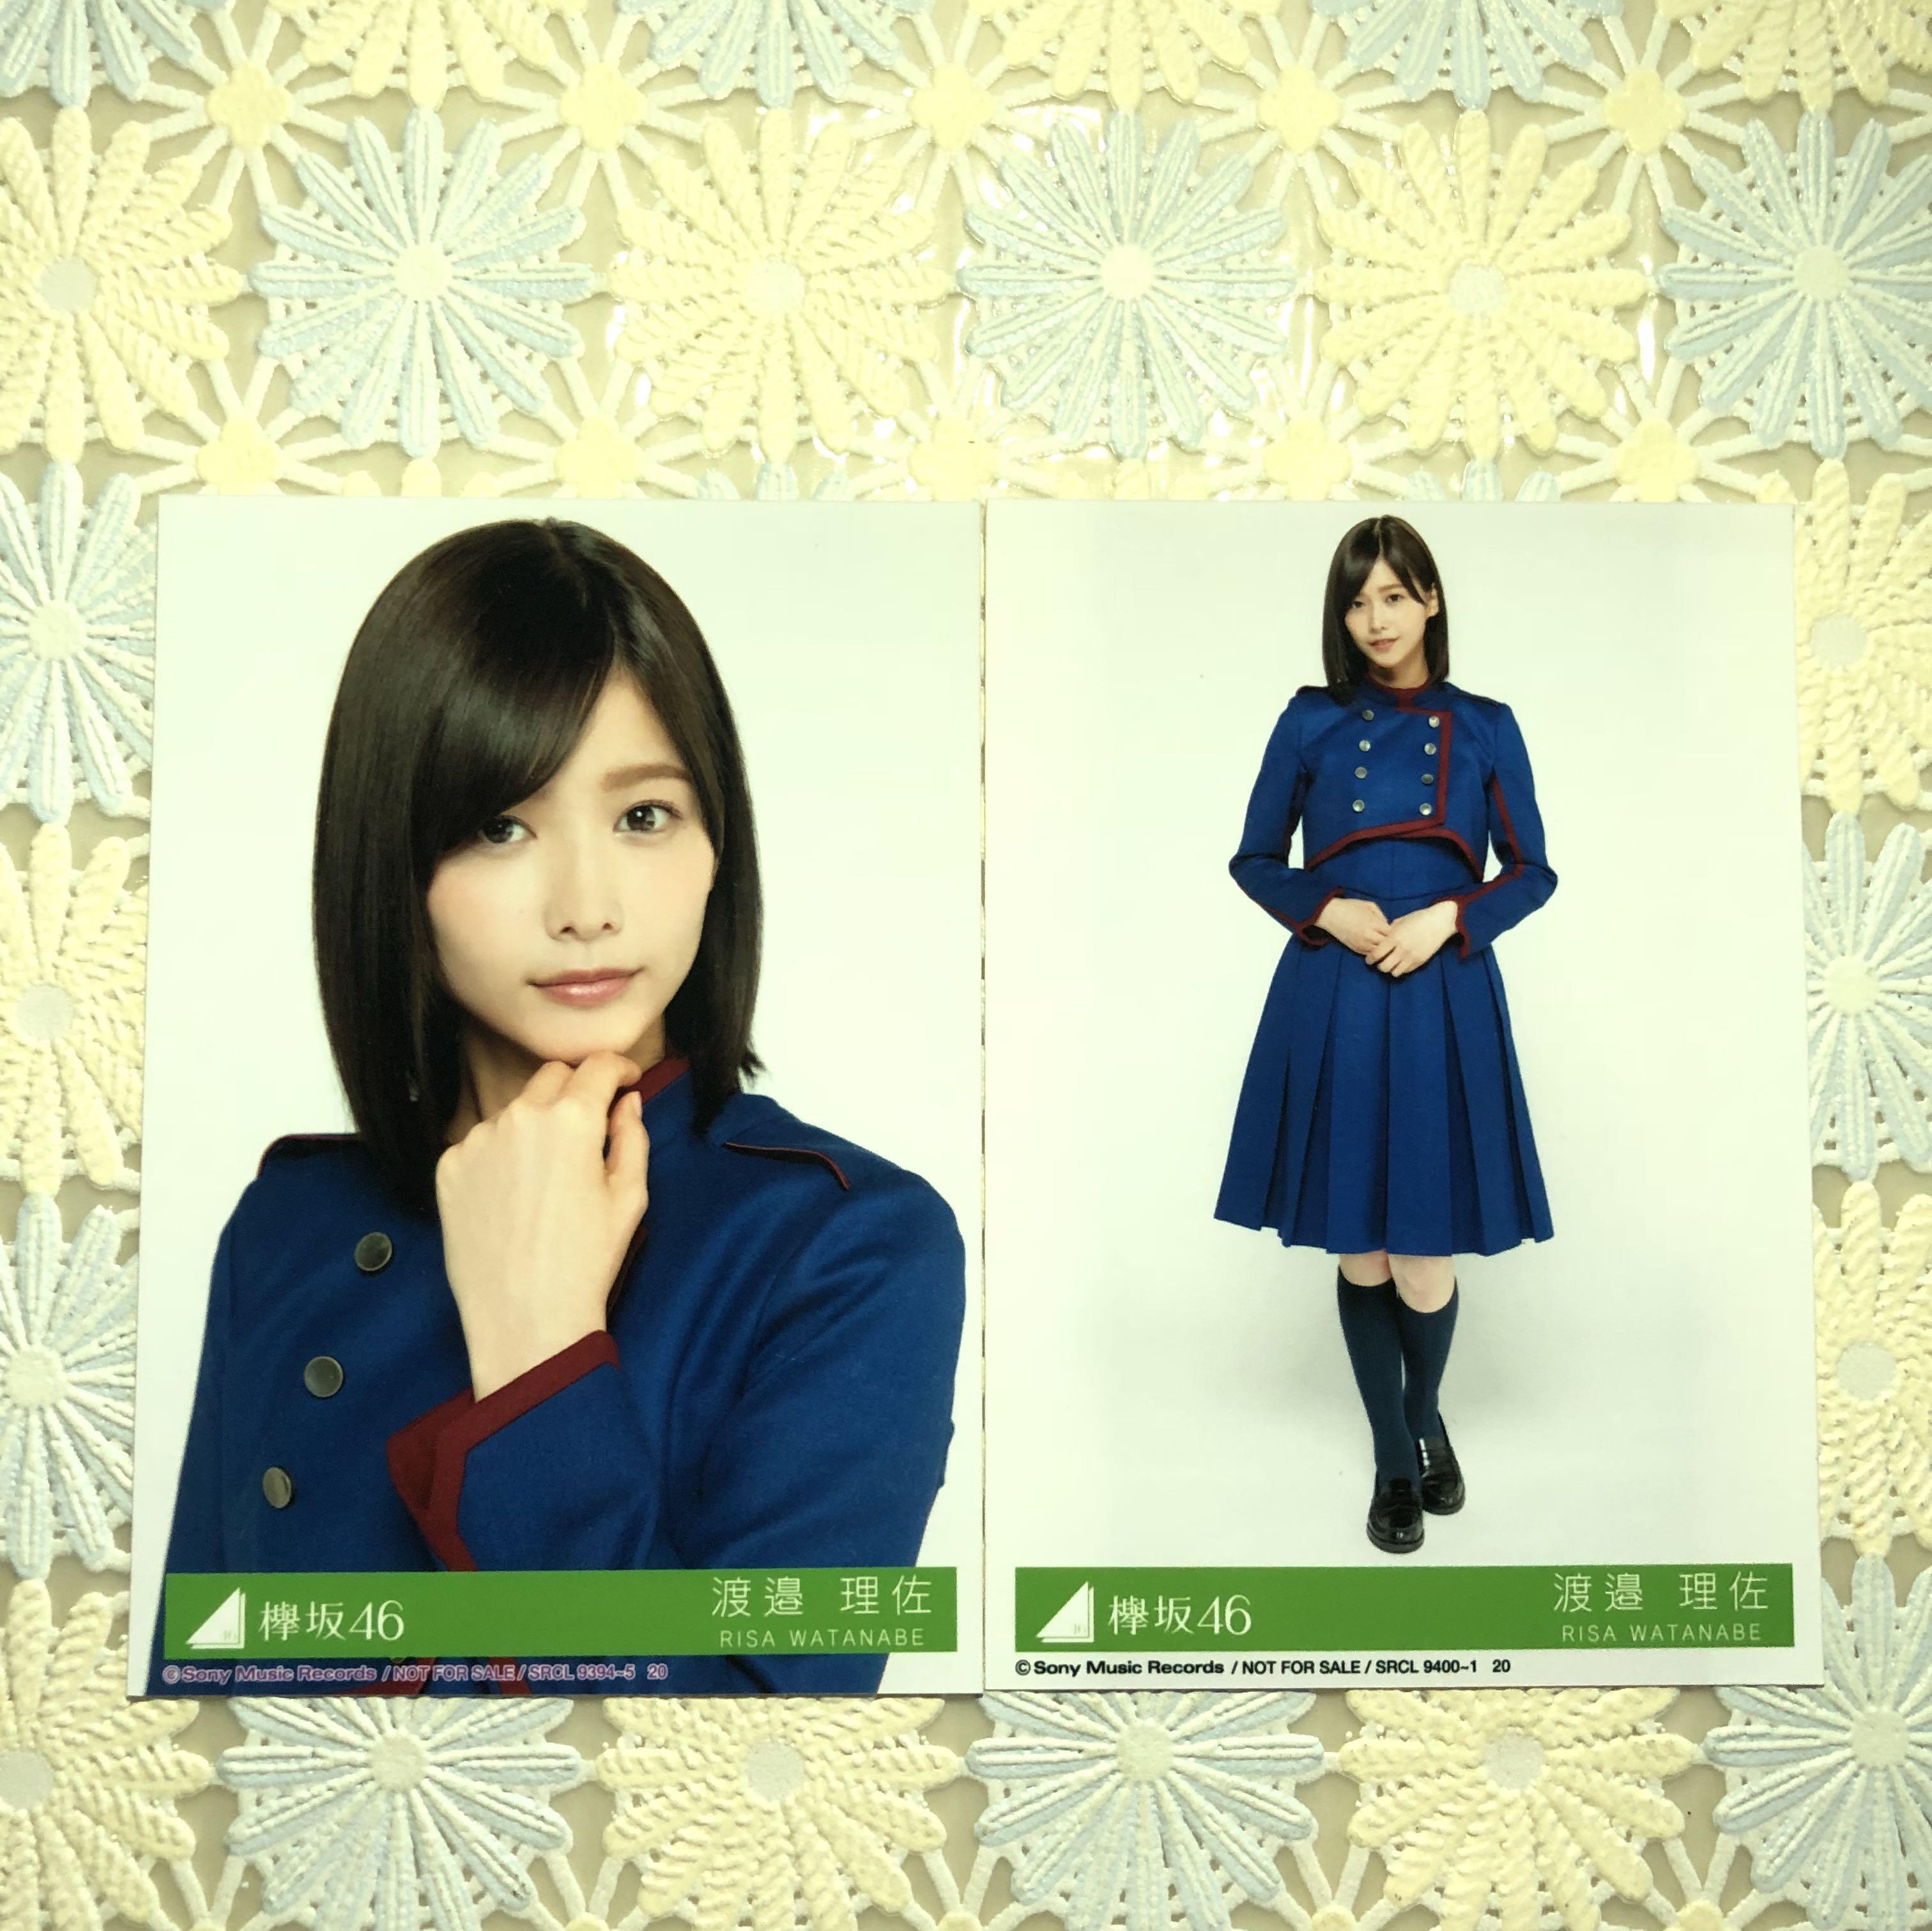 Keyakizaka46 Fukyouwaon photopack